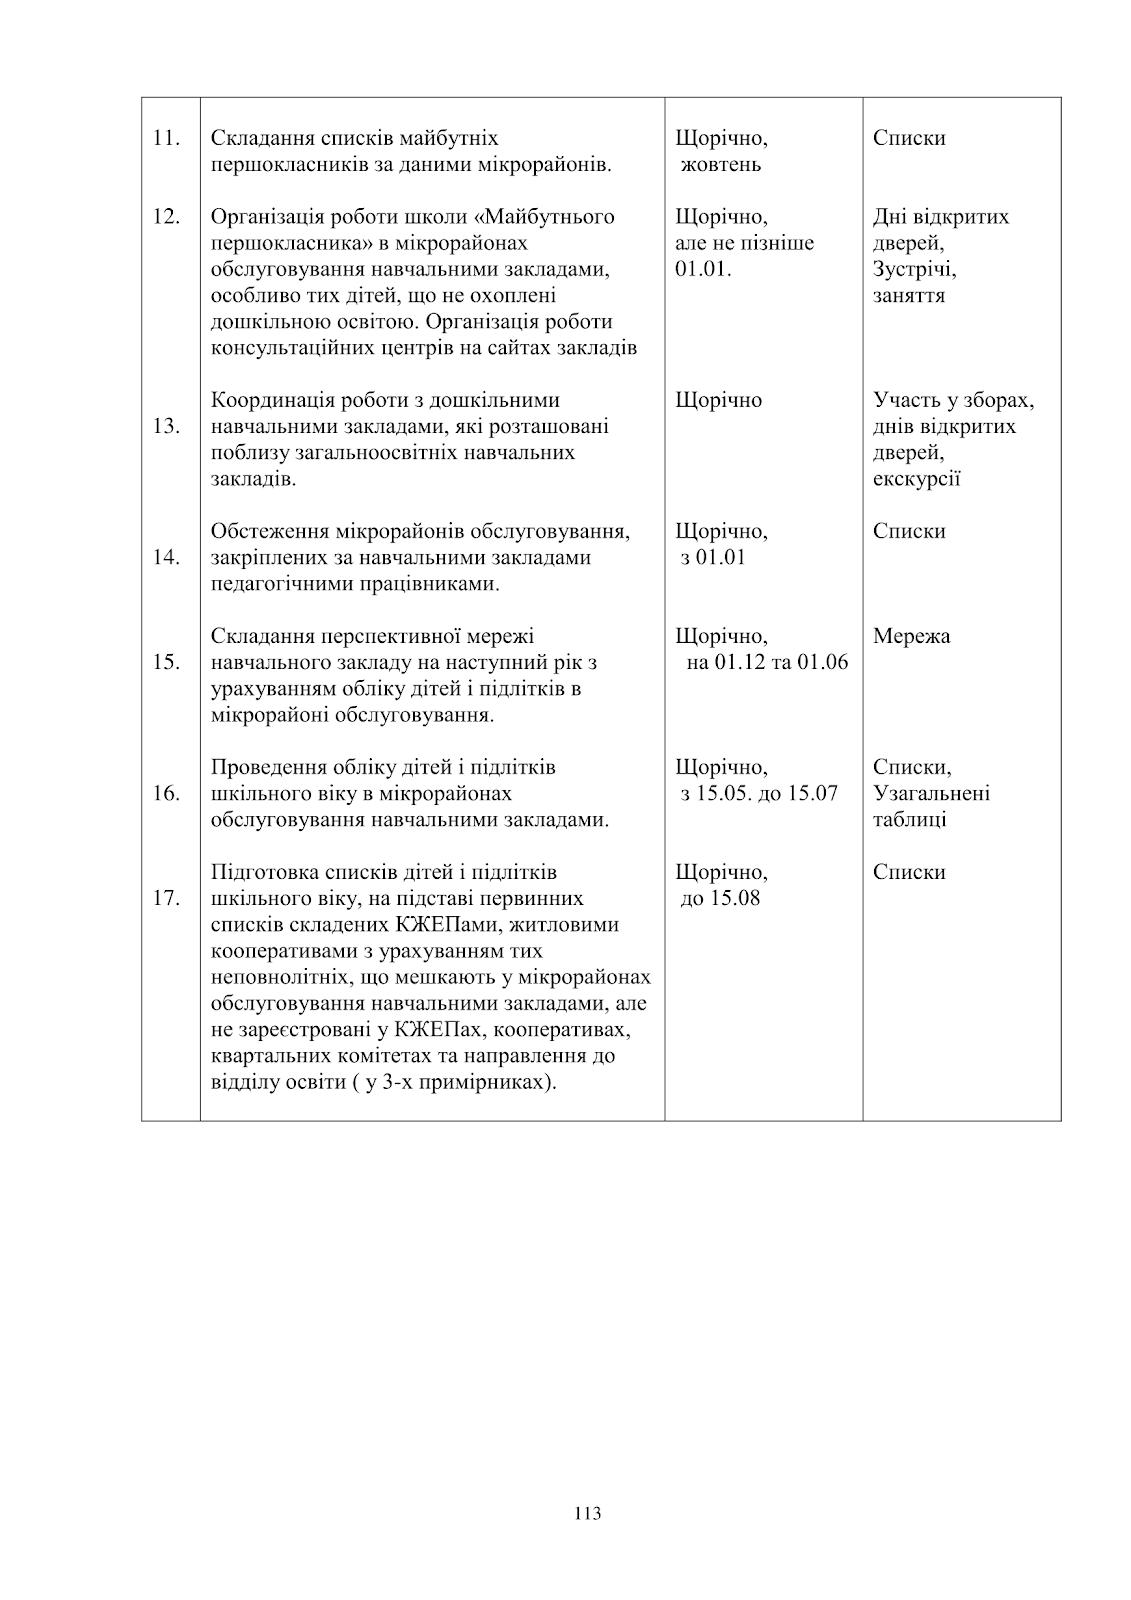 C:\Users\Валерия\Desktop\план 2016 рік\план 2016 рік-113.png